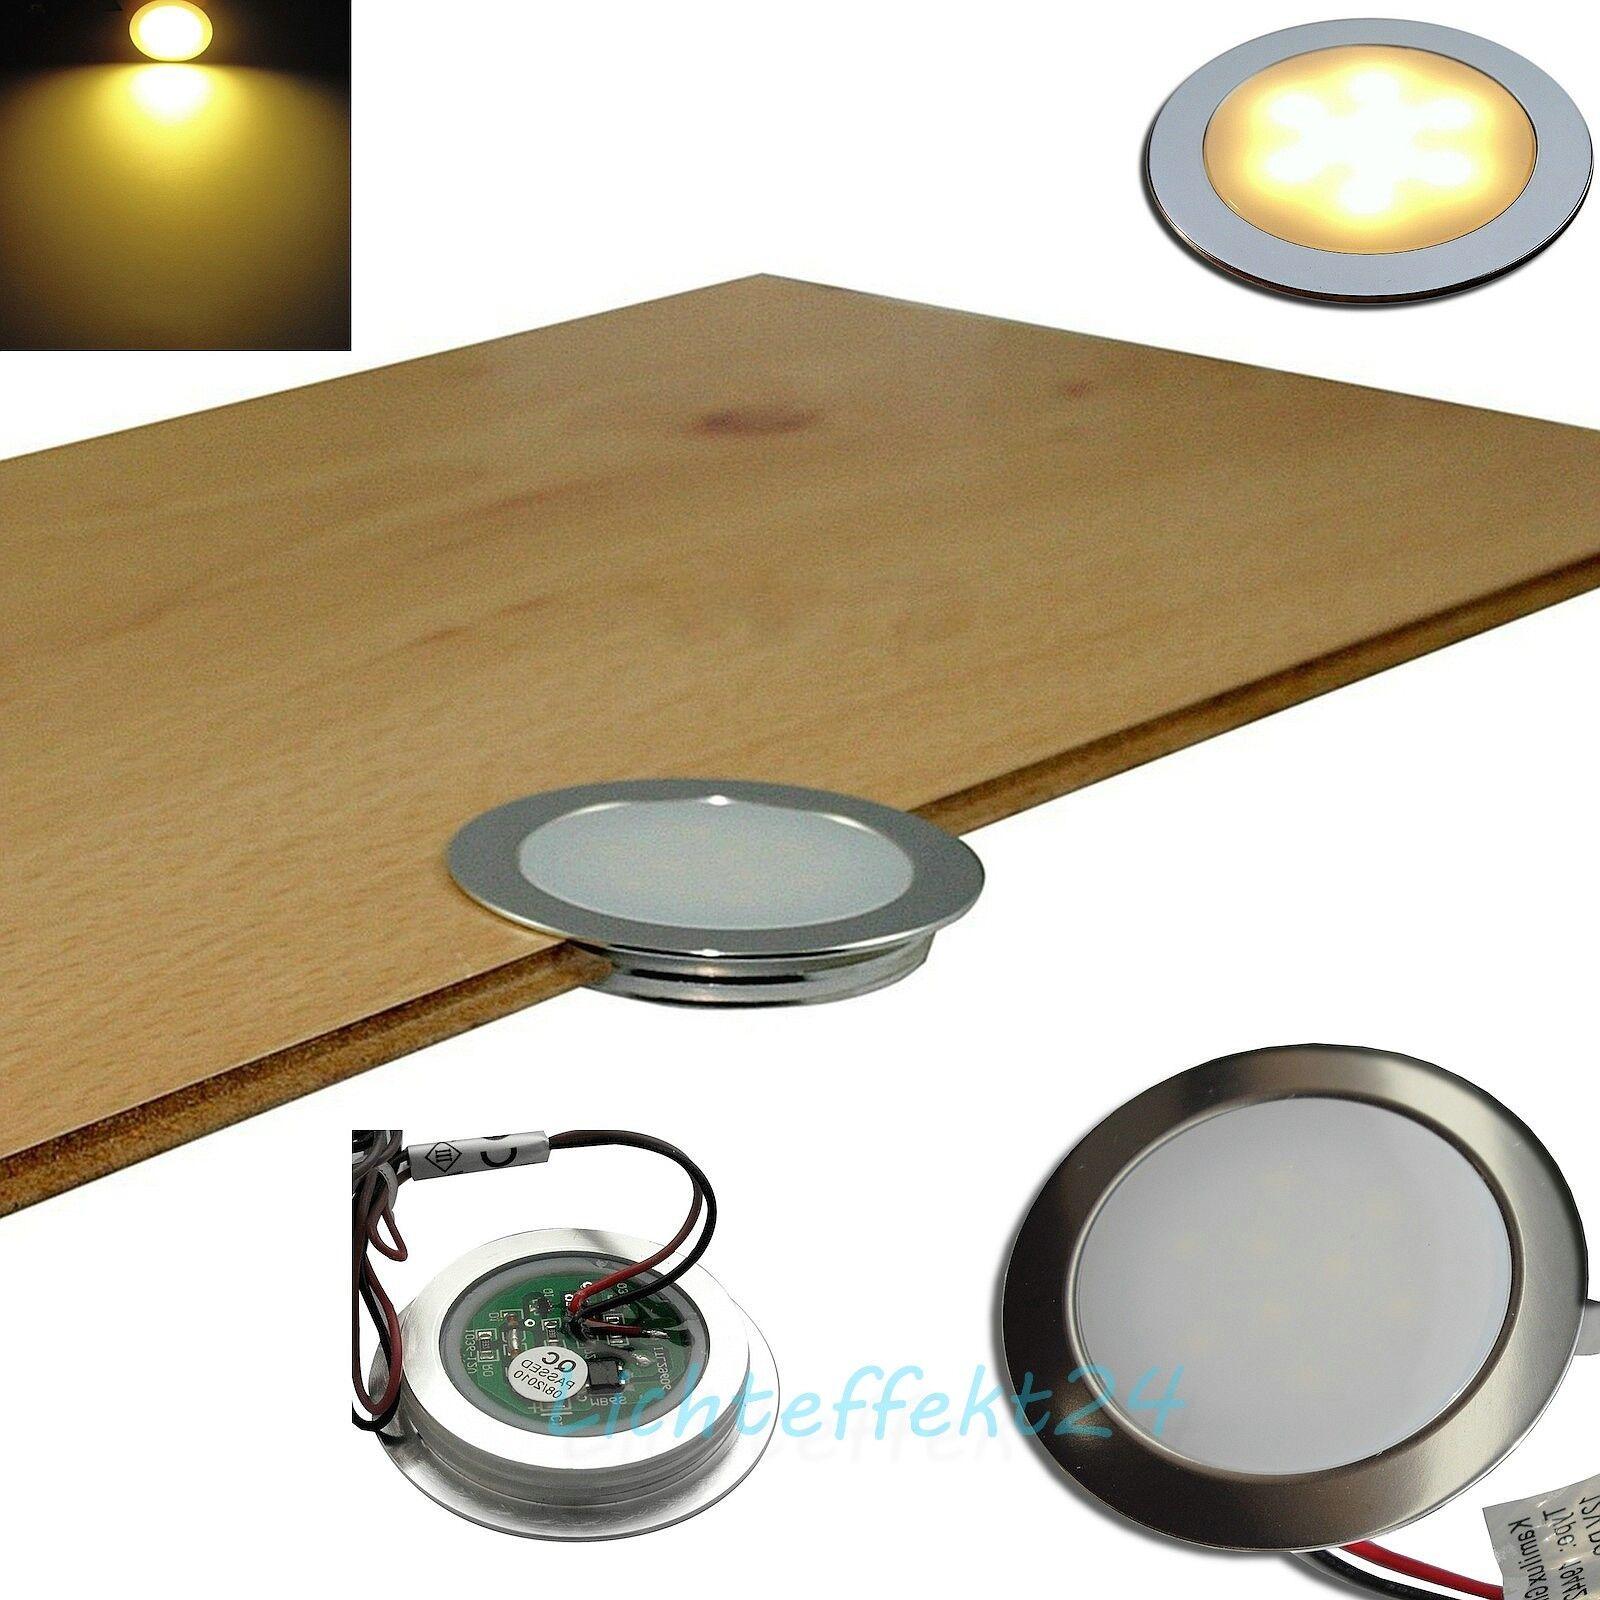 1- 10er Sets flache LED Einbaulampen   Bodenstrahler   Wandleuchte   Bad   IP67